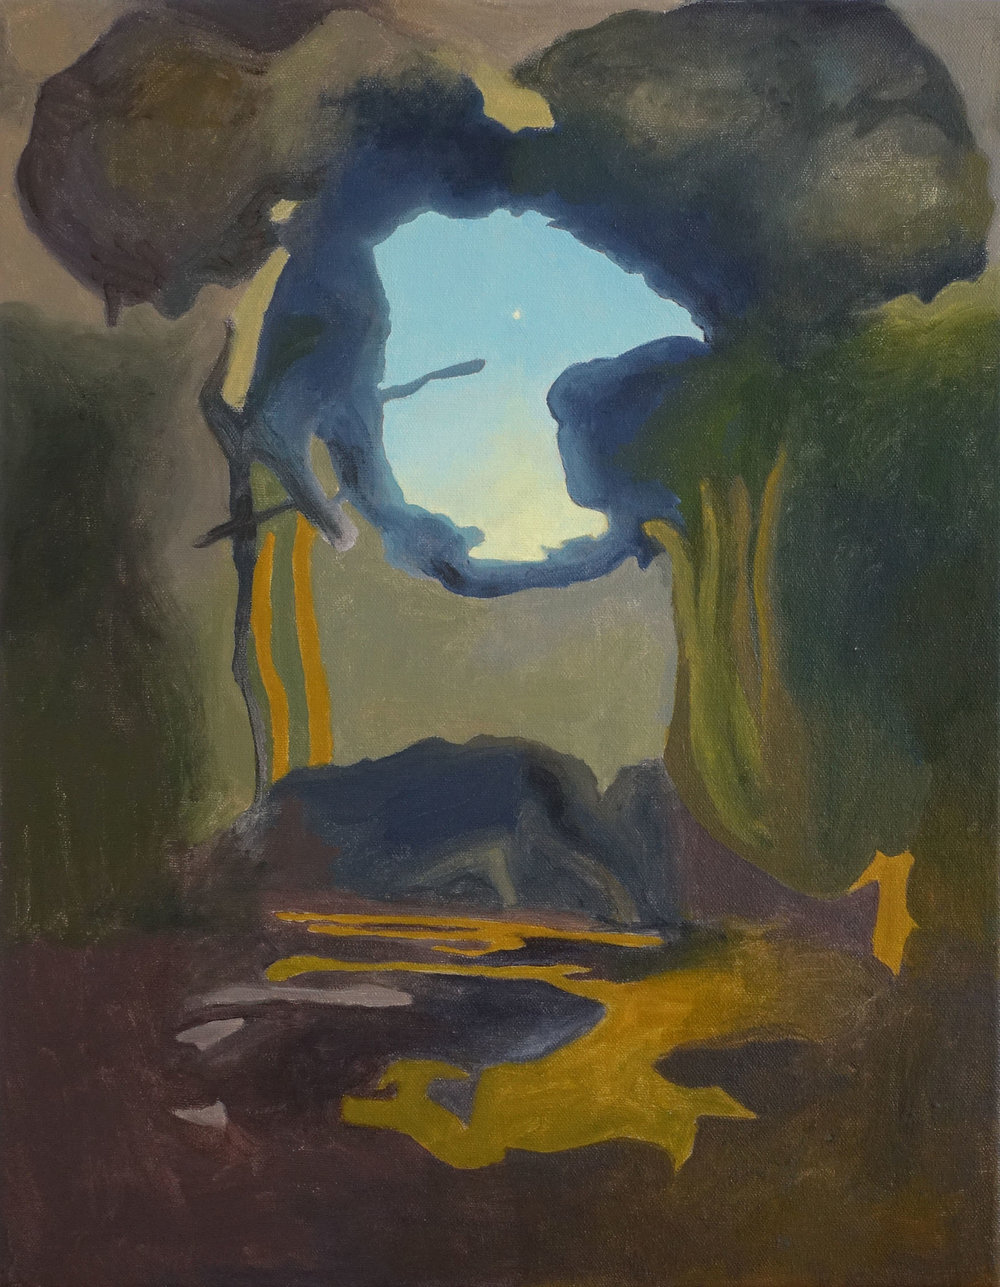 Untitled (Cerulean), 2017